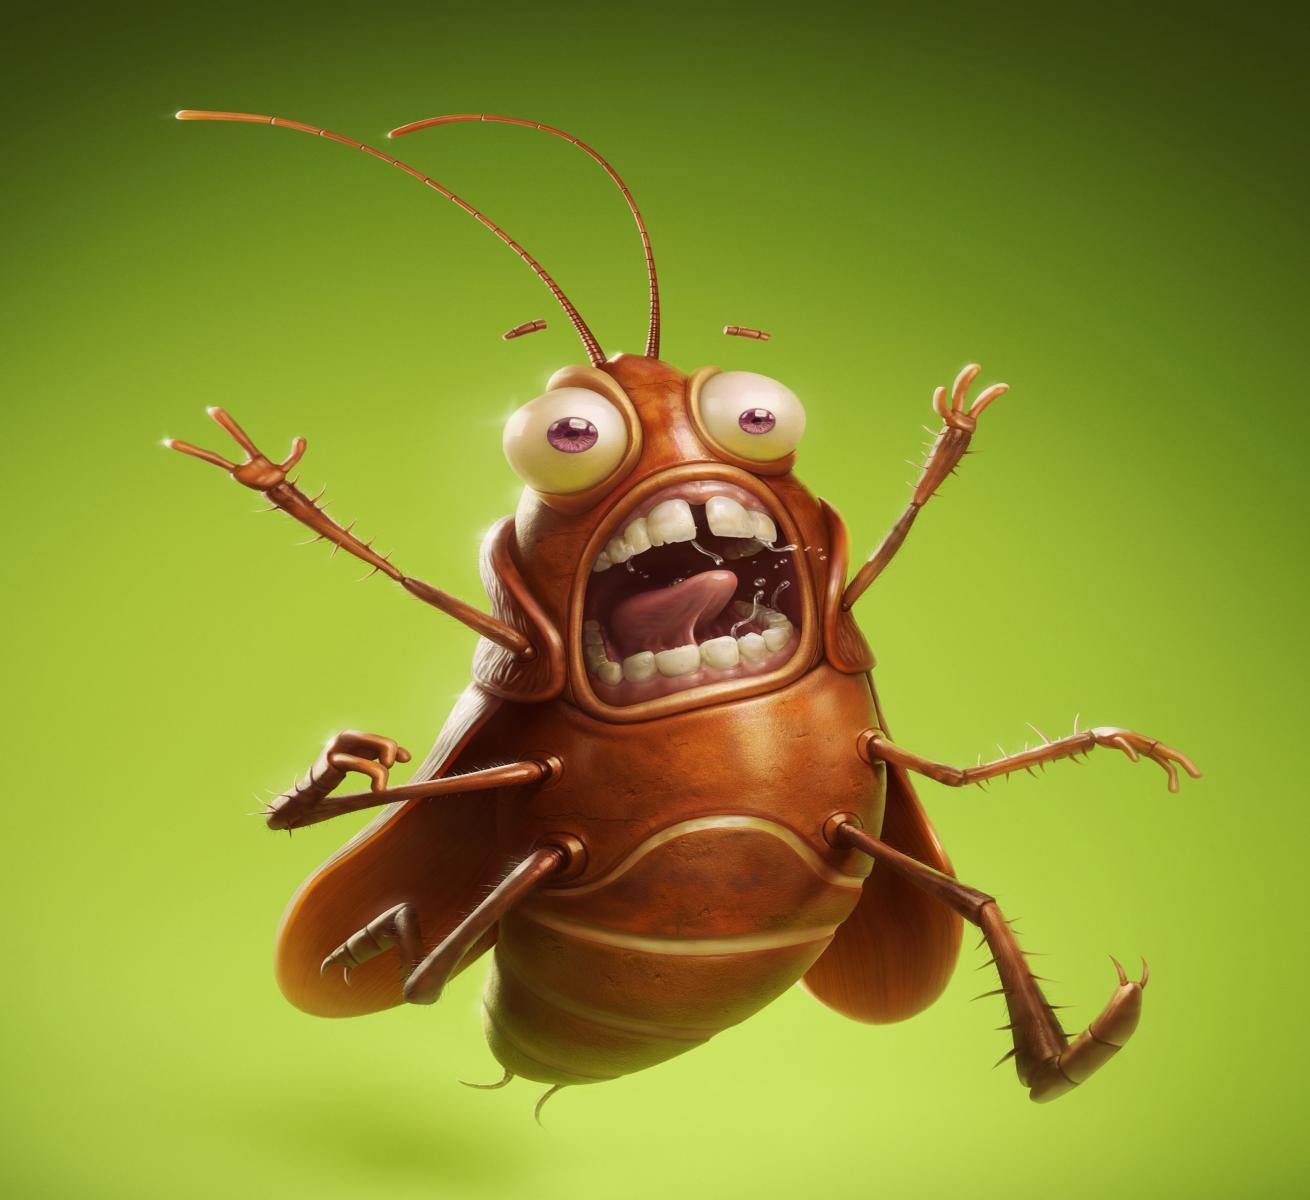 Брянец купил батон с запеченным тараканом